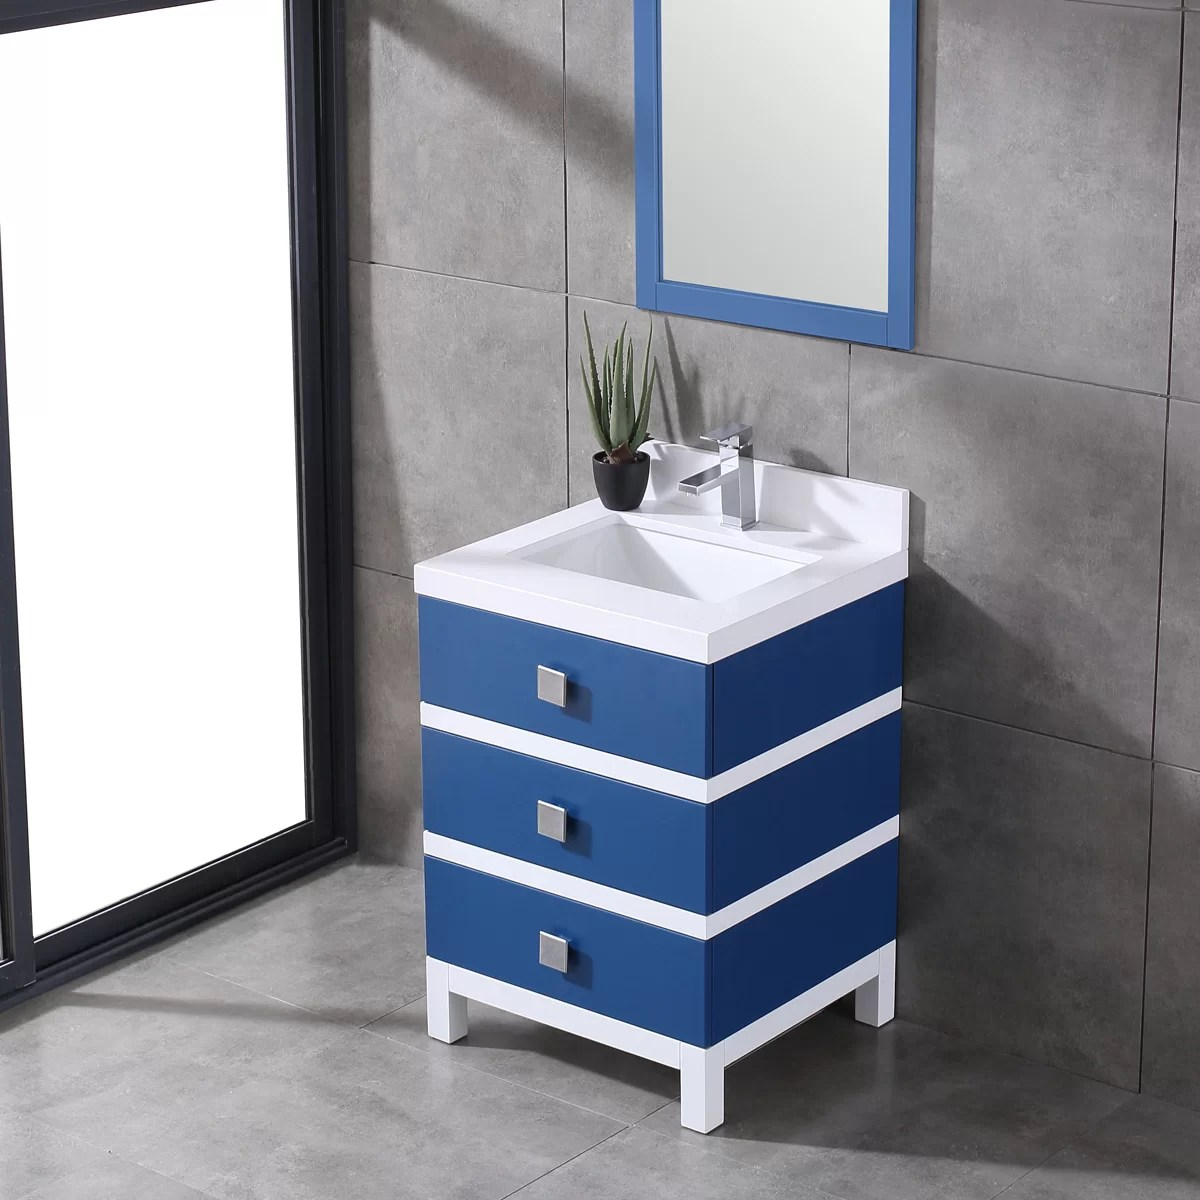 Eviva Sydney 24 Inch Blue And White Bathroom Vanity Wayfair